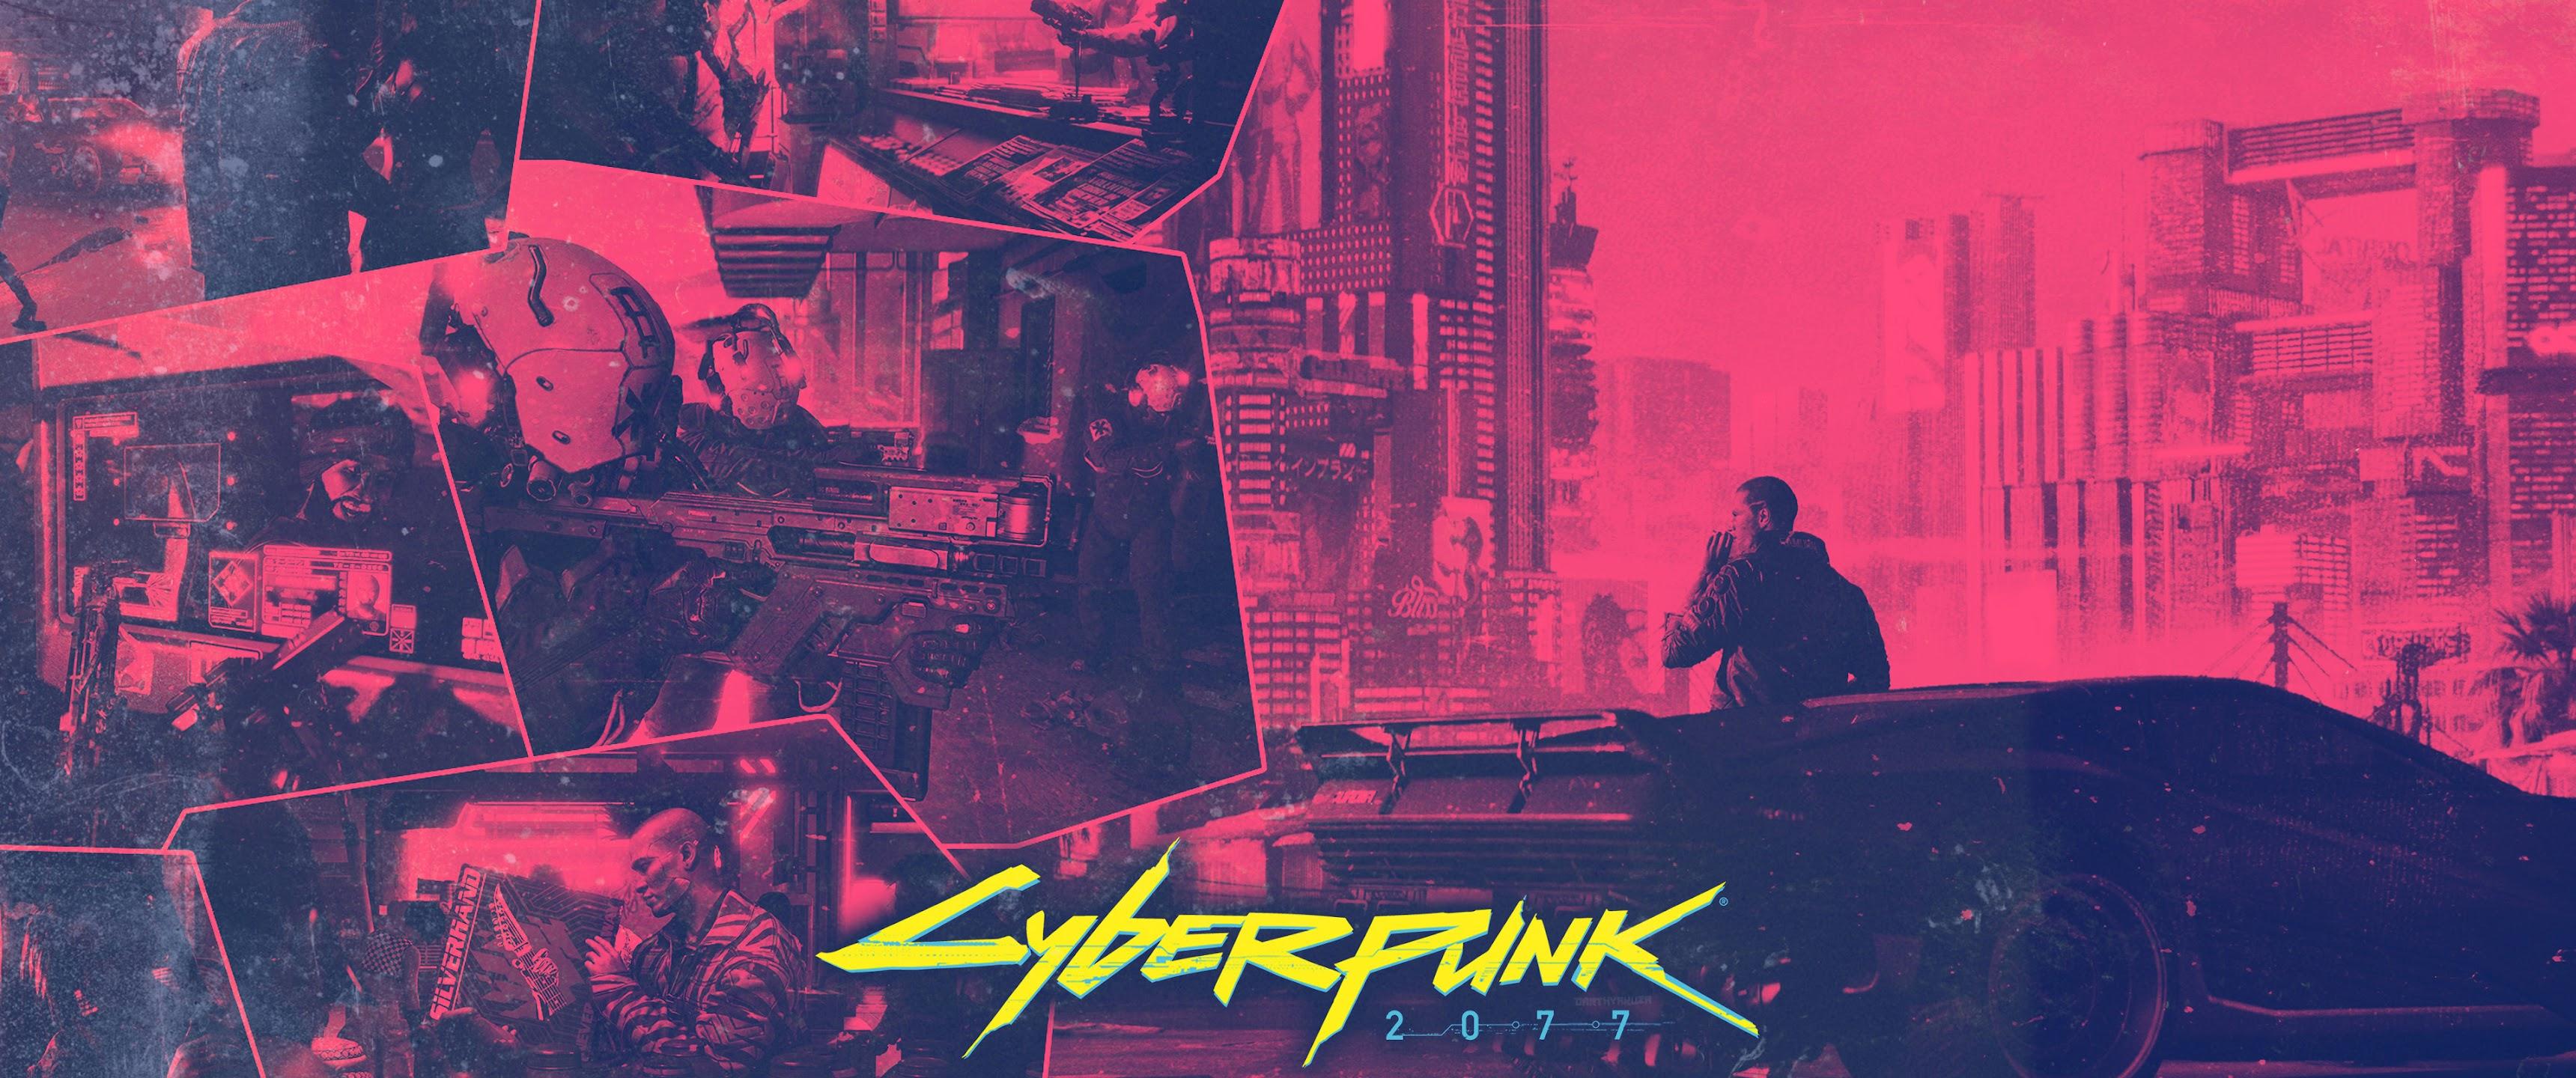 Cyberpunk 2077, 4K, #101 Wallpaper